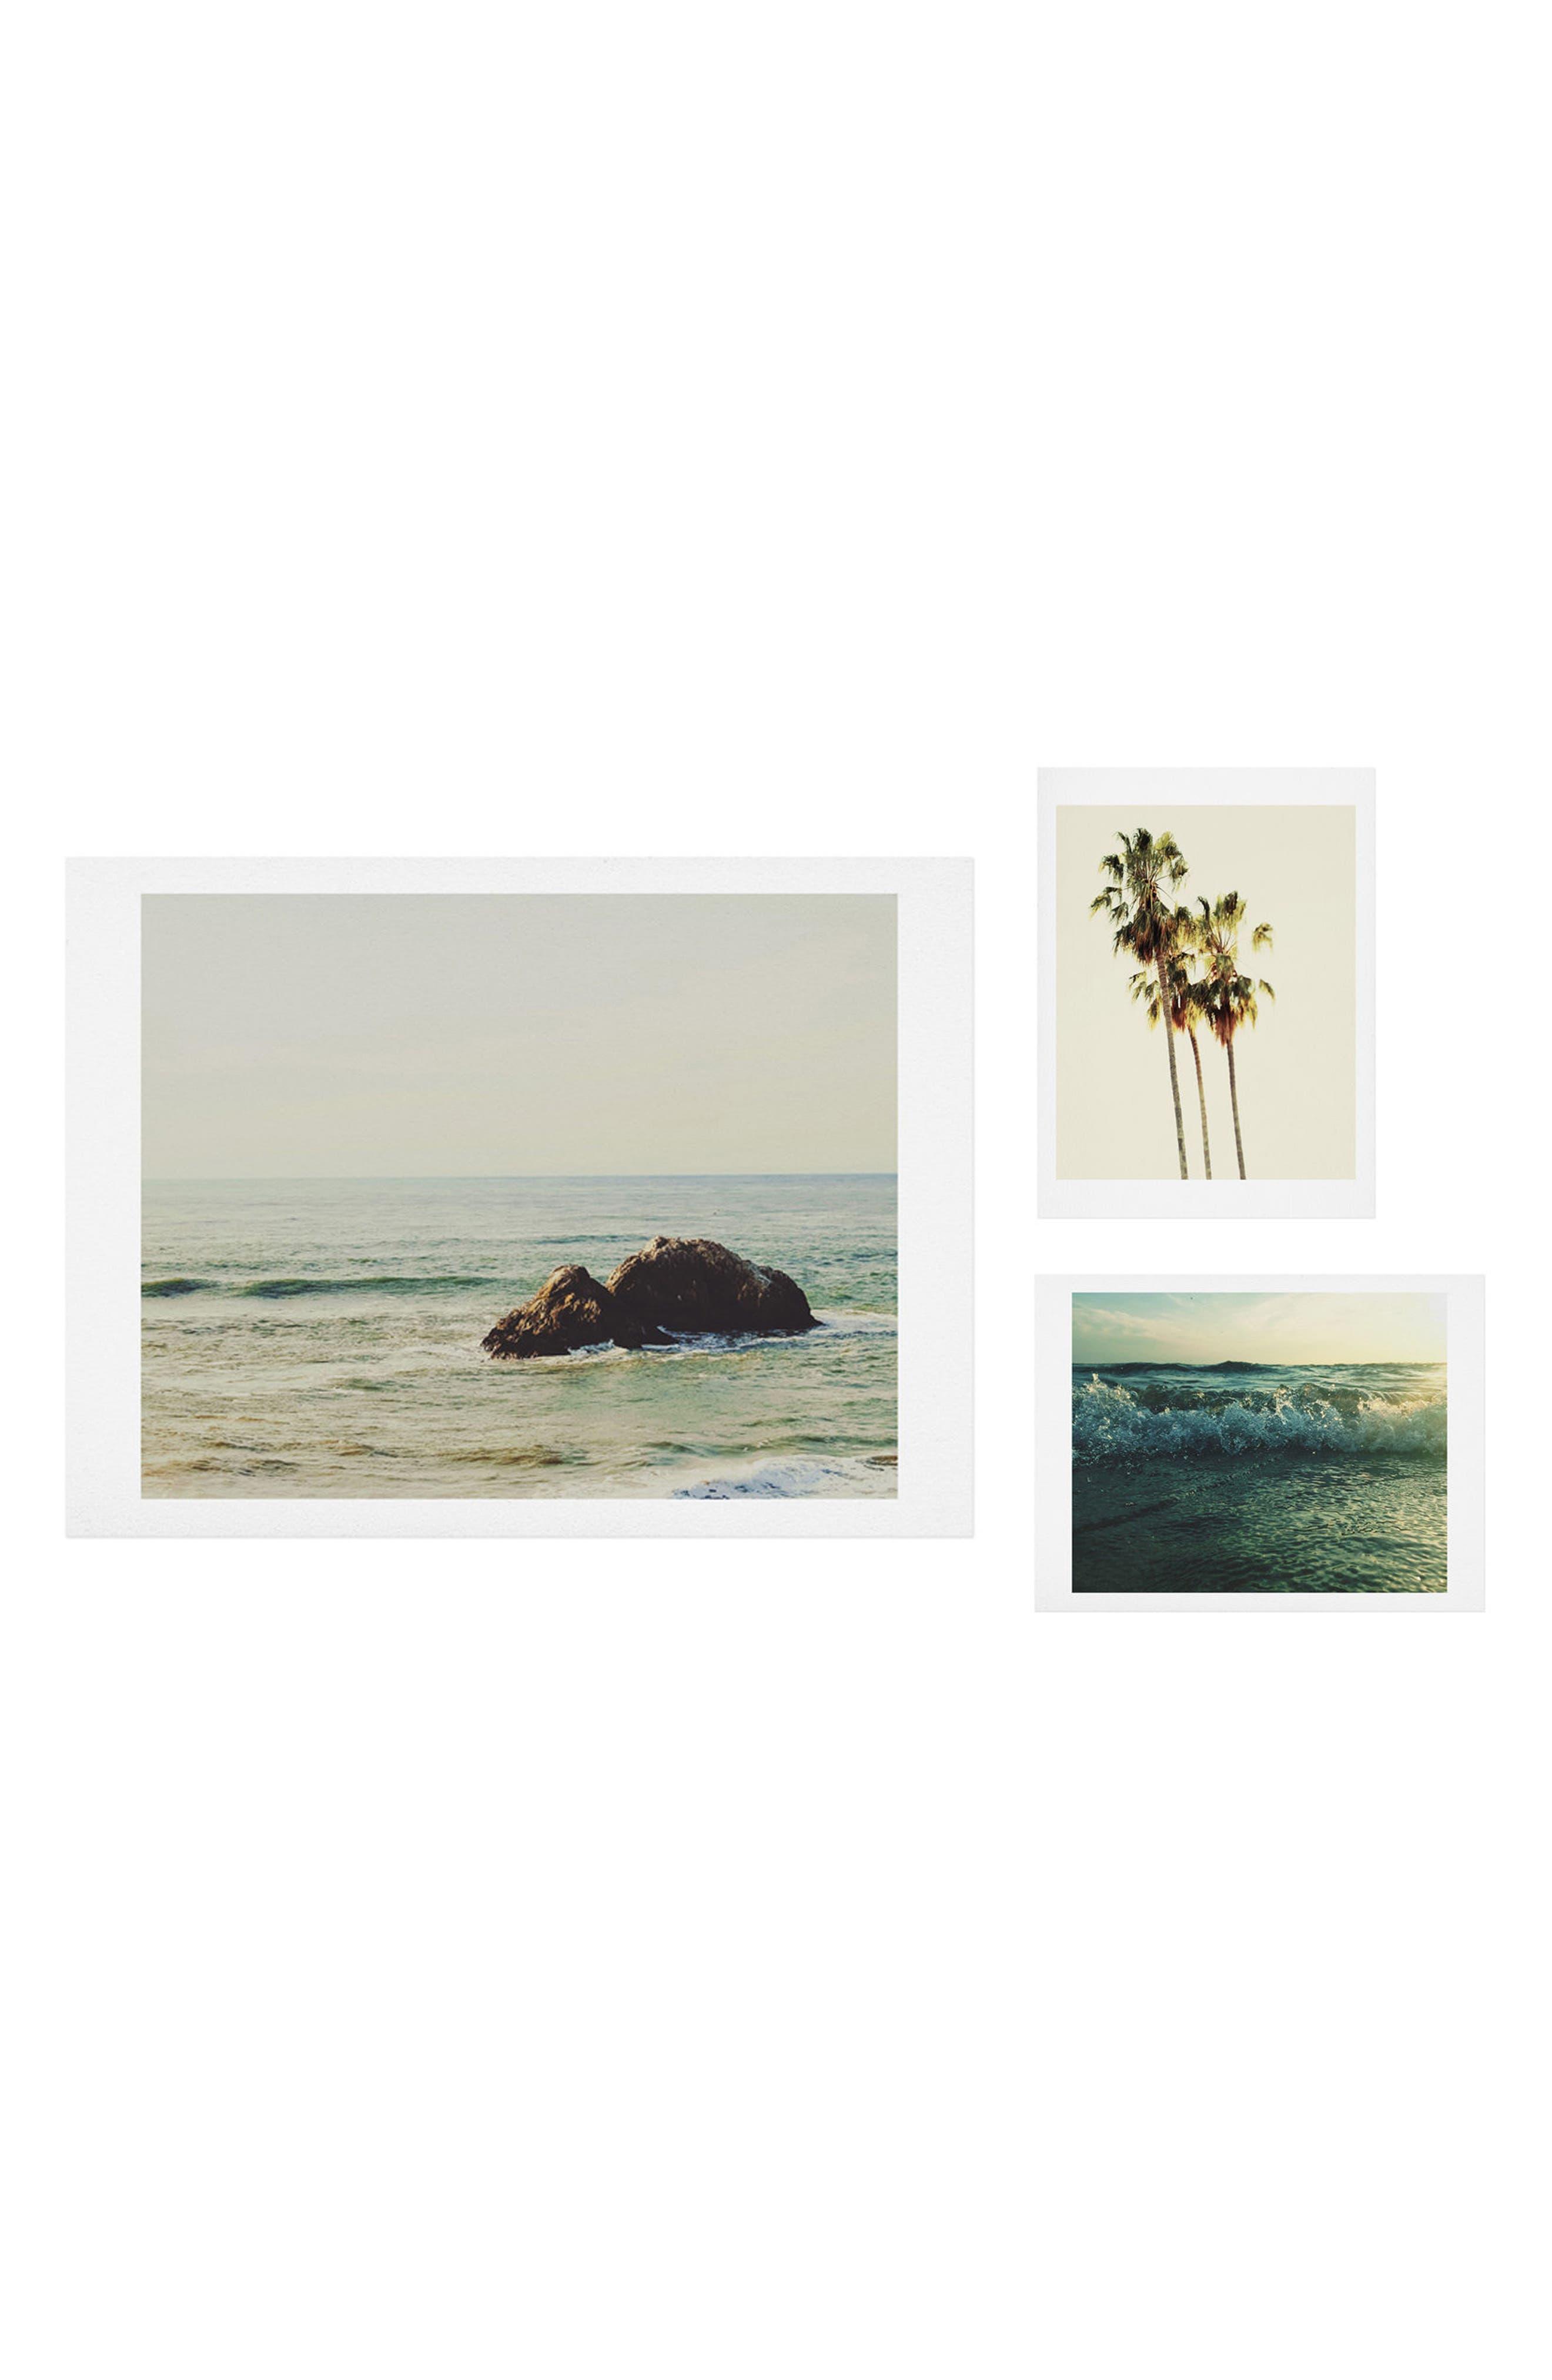 Ocean Calling 3-Piece Gallery Wall Art Print Set,                         Main,                         color, GREEN/ BLUE